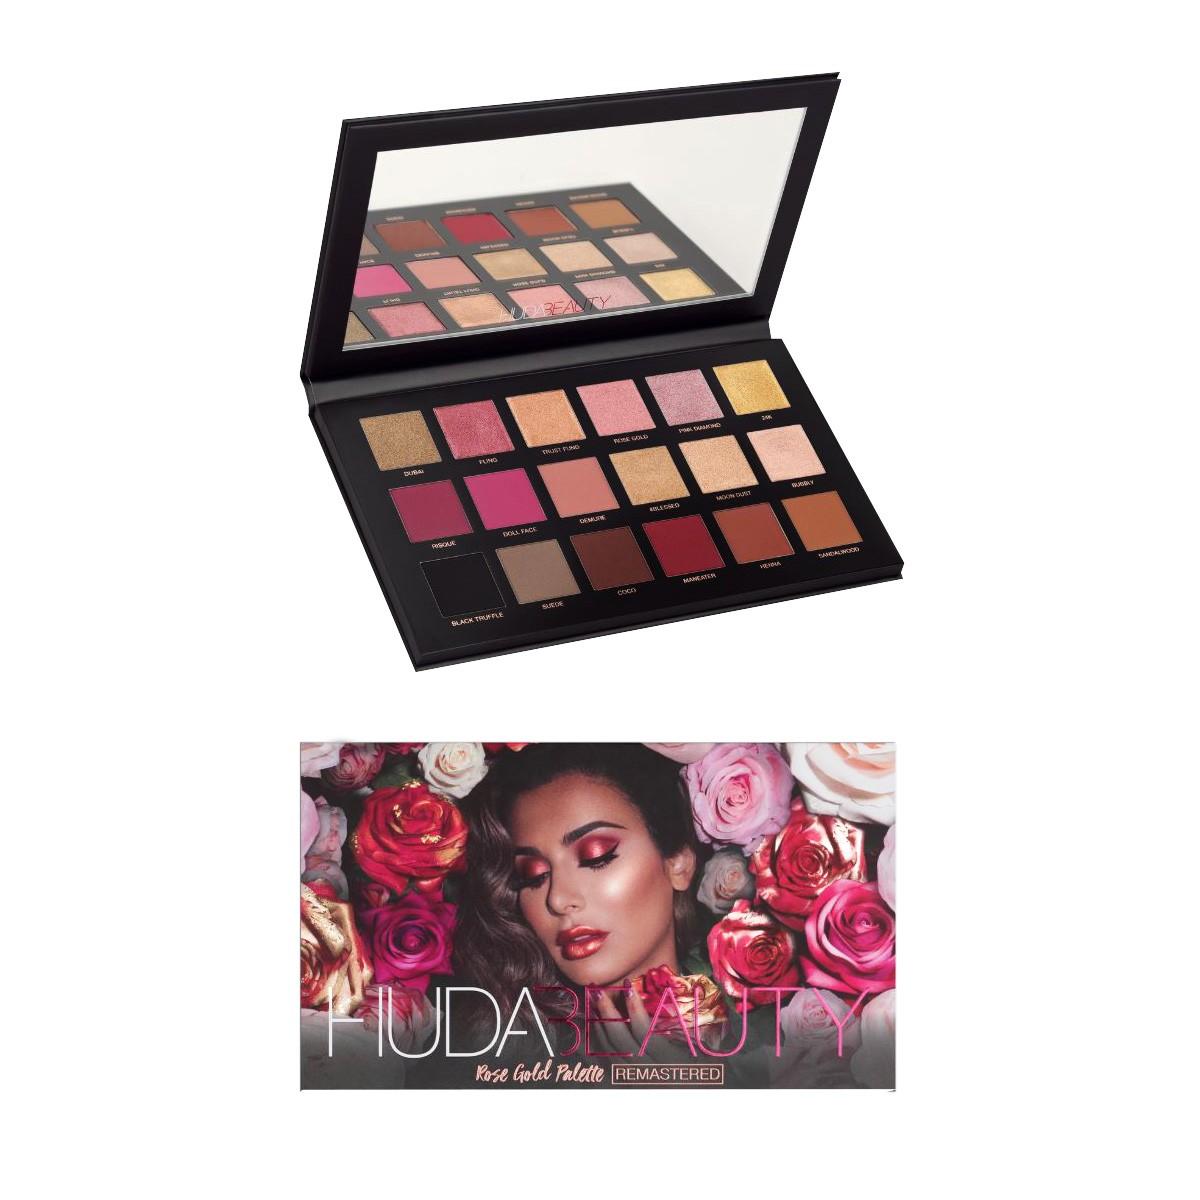 Kit 3 Paletas: Ludurana - Hud Beauty C/ Brinde